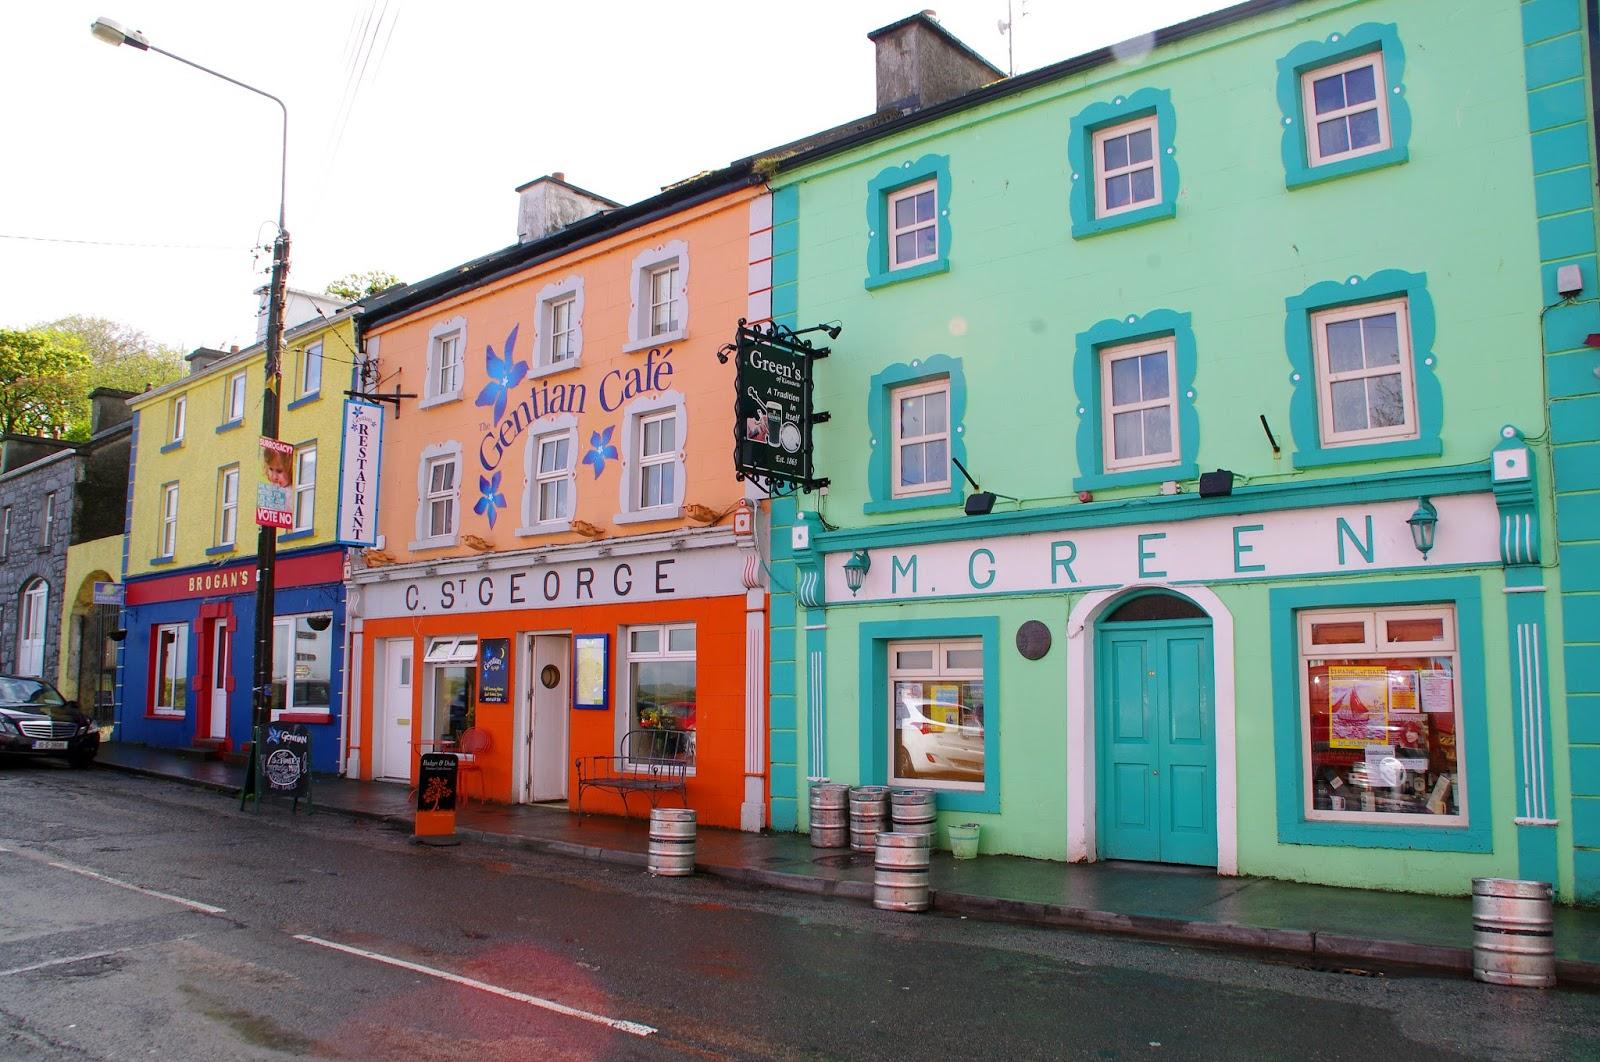 Colourful shopfronts in Kinvarra Ireland